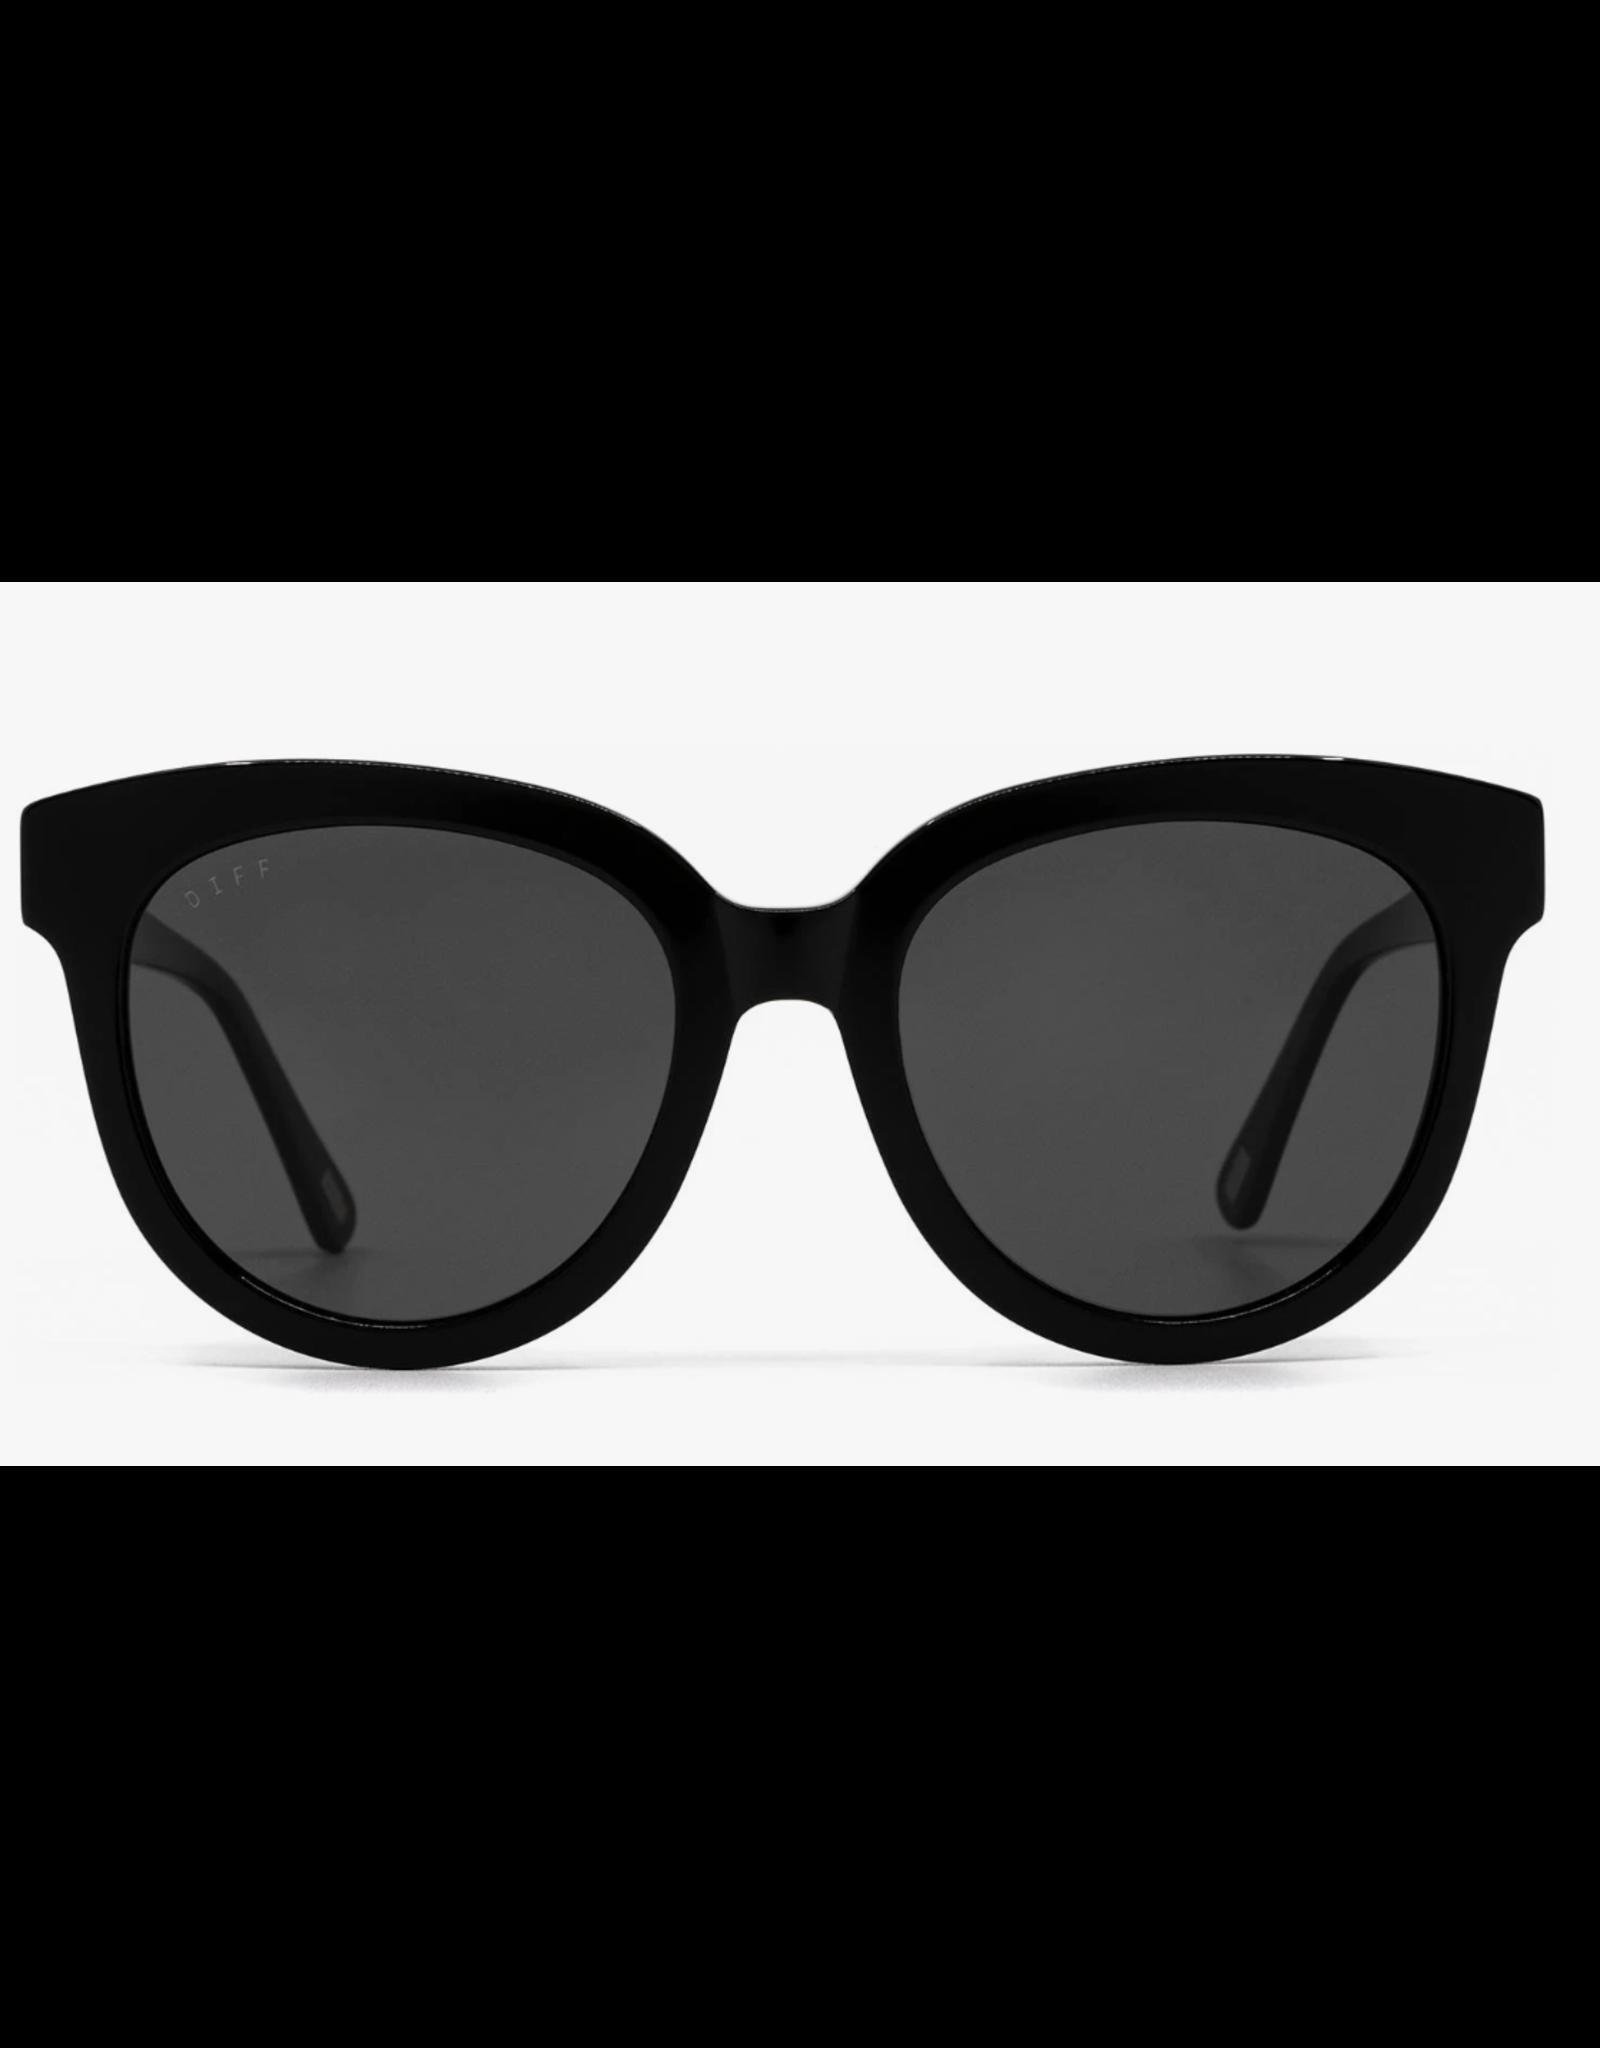 Diff Eyewear April Sunglasses